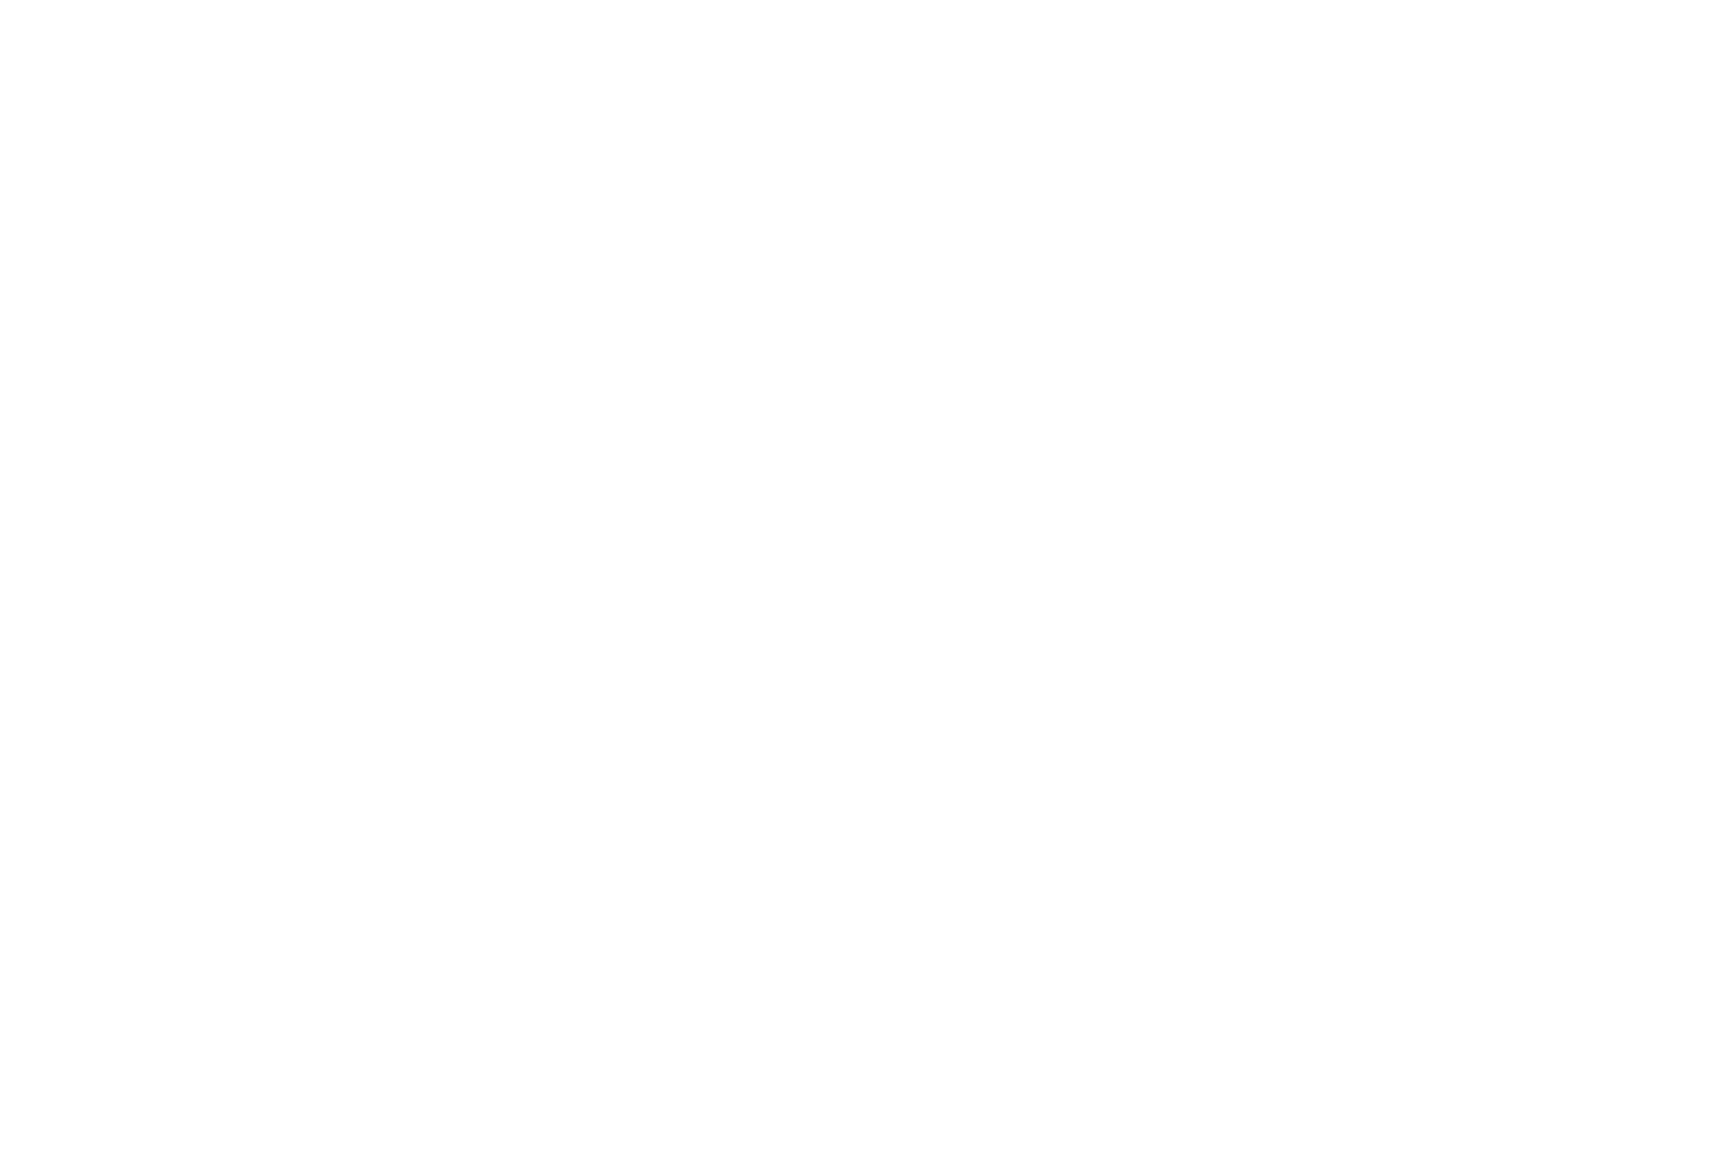 OFFICIAL SELECTION - FantasySci-Fi Film  Screenplay Festival - 2018 (1).png